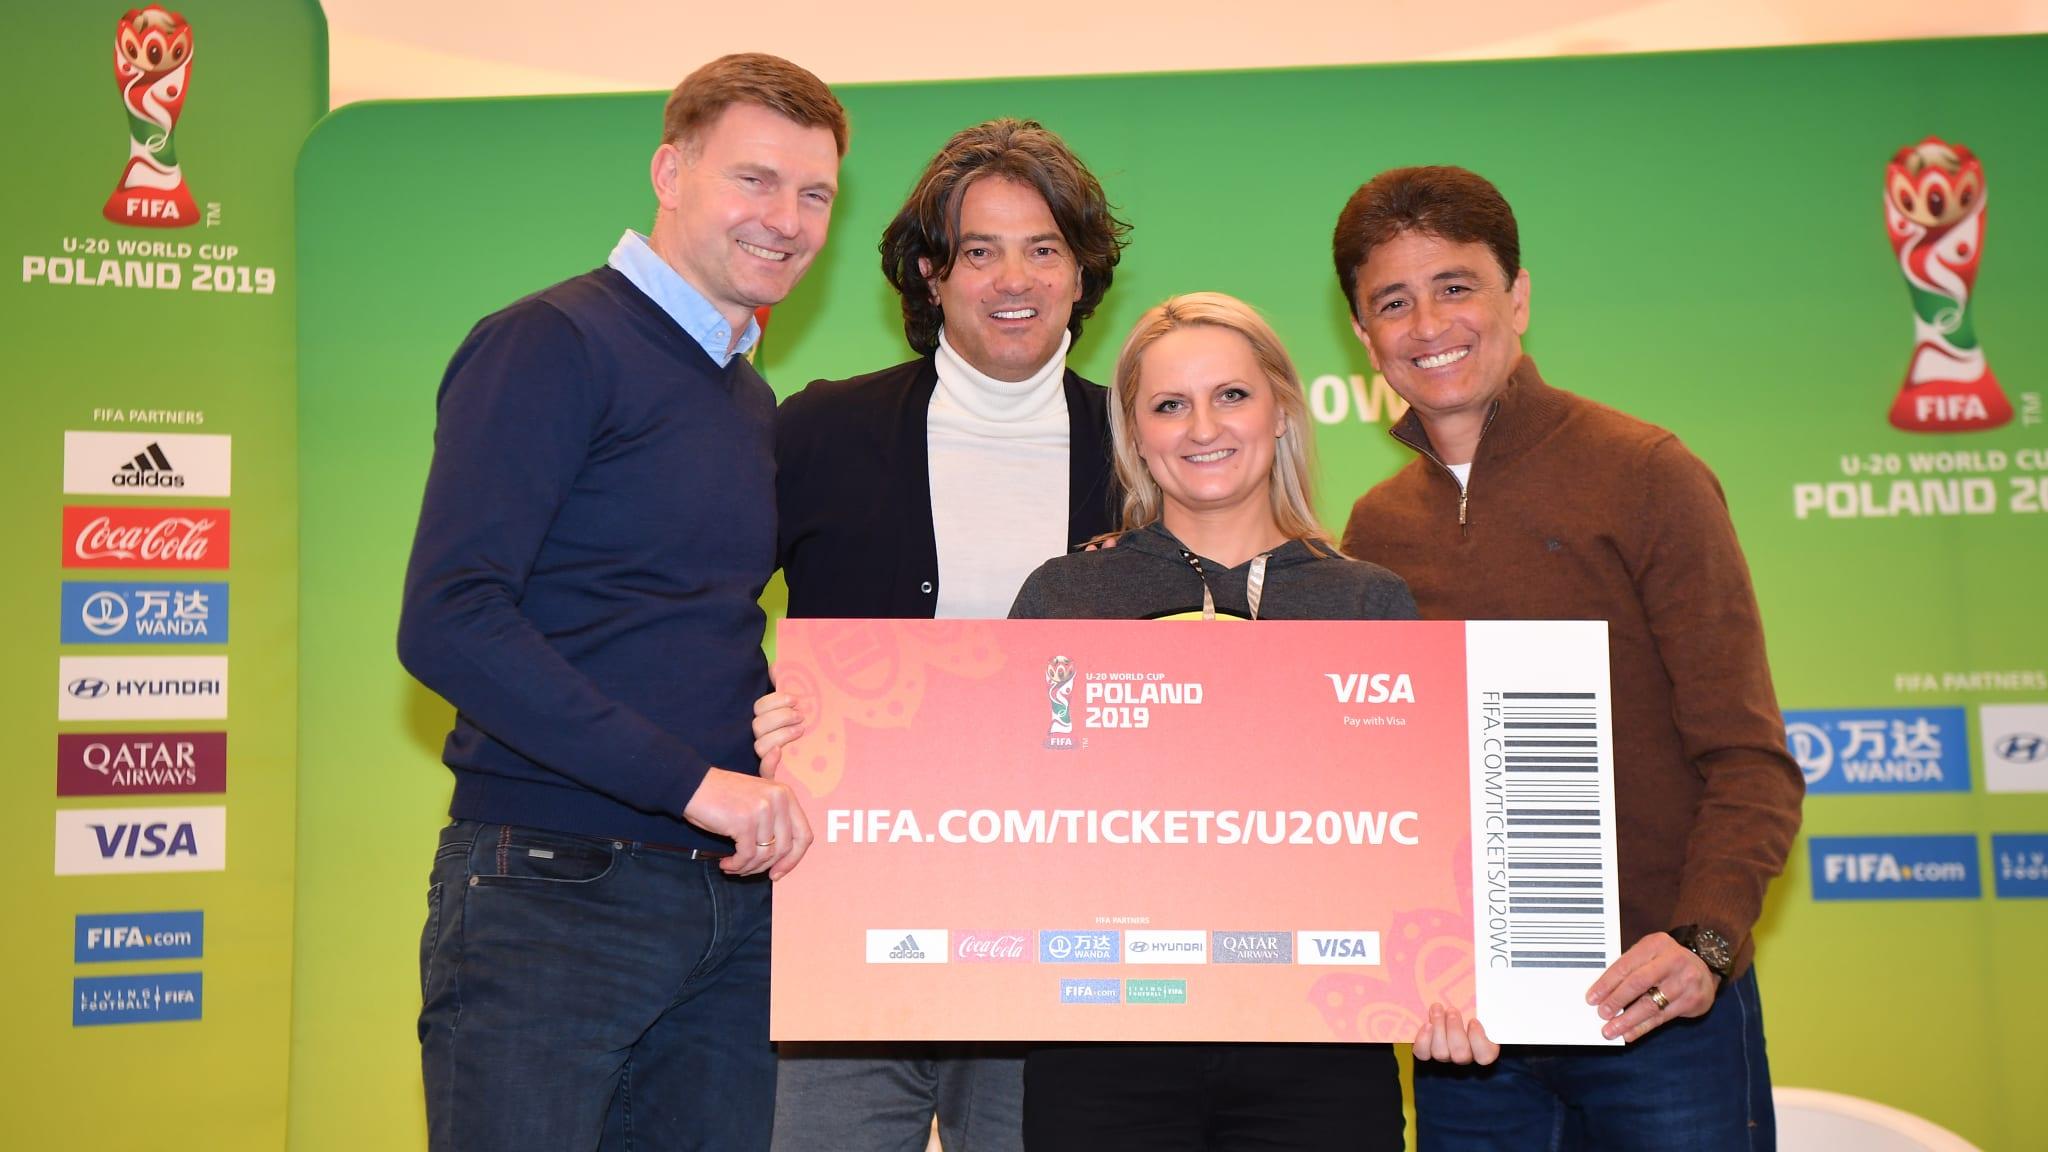 FIFA U 20 World Cup Poland 2019   News   FIFA U 20 World Cup 2048x1152